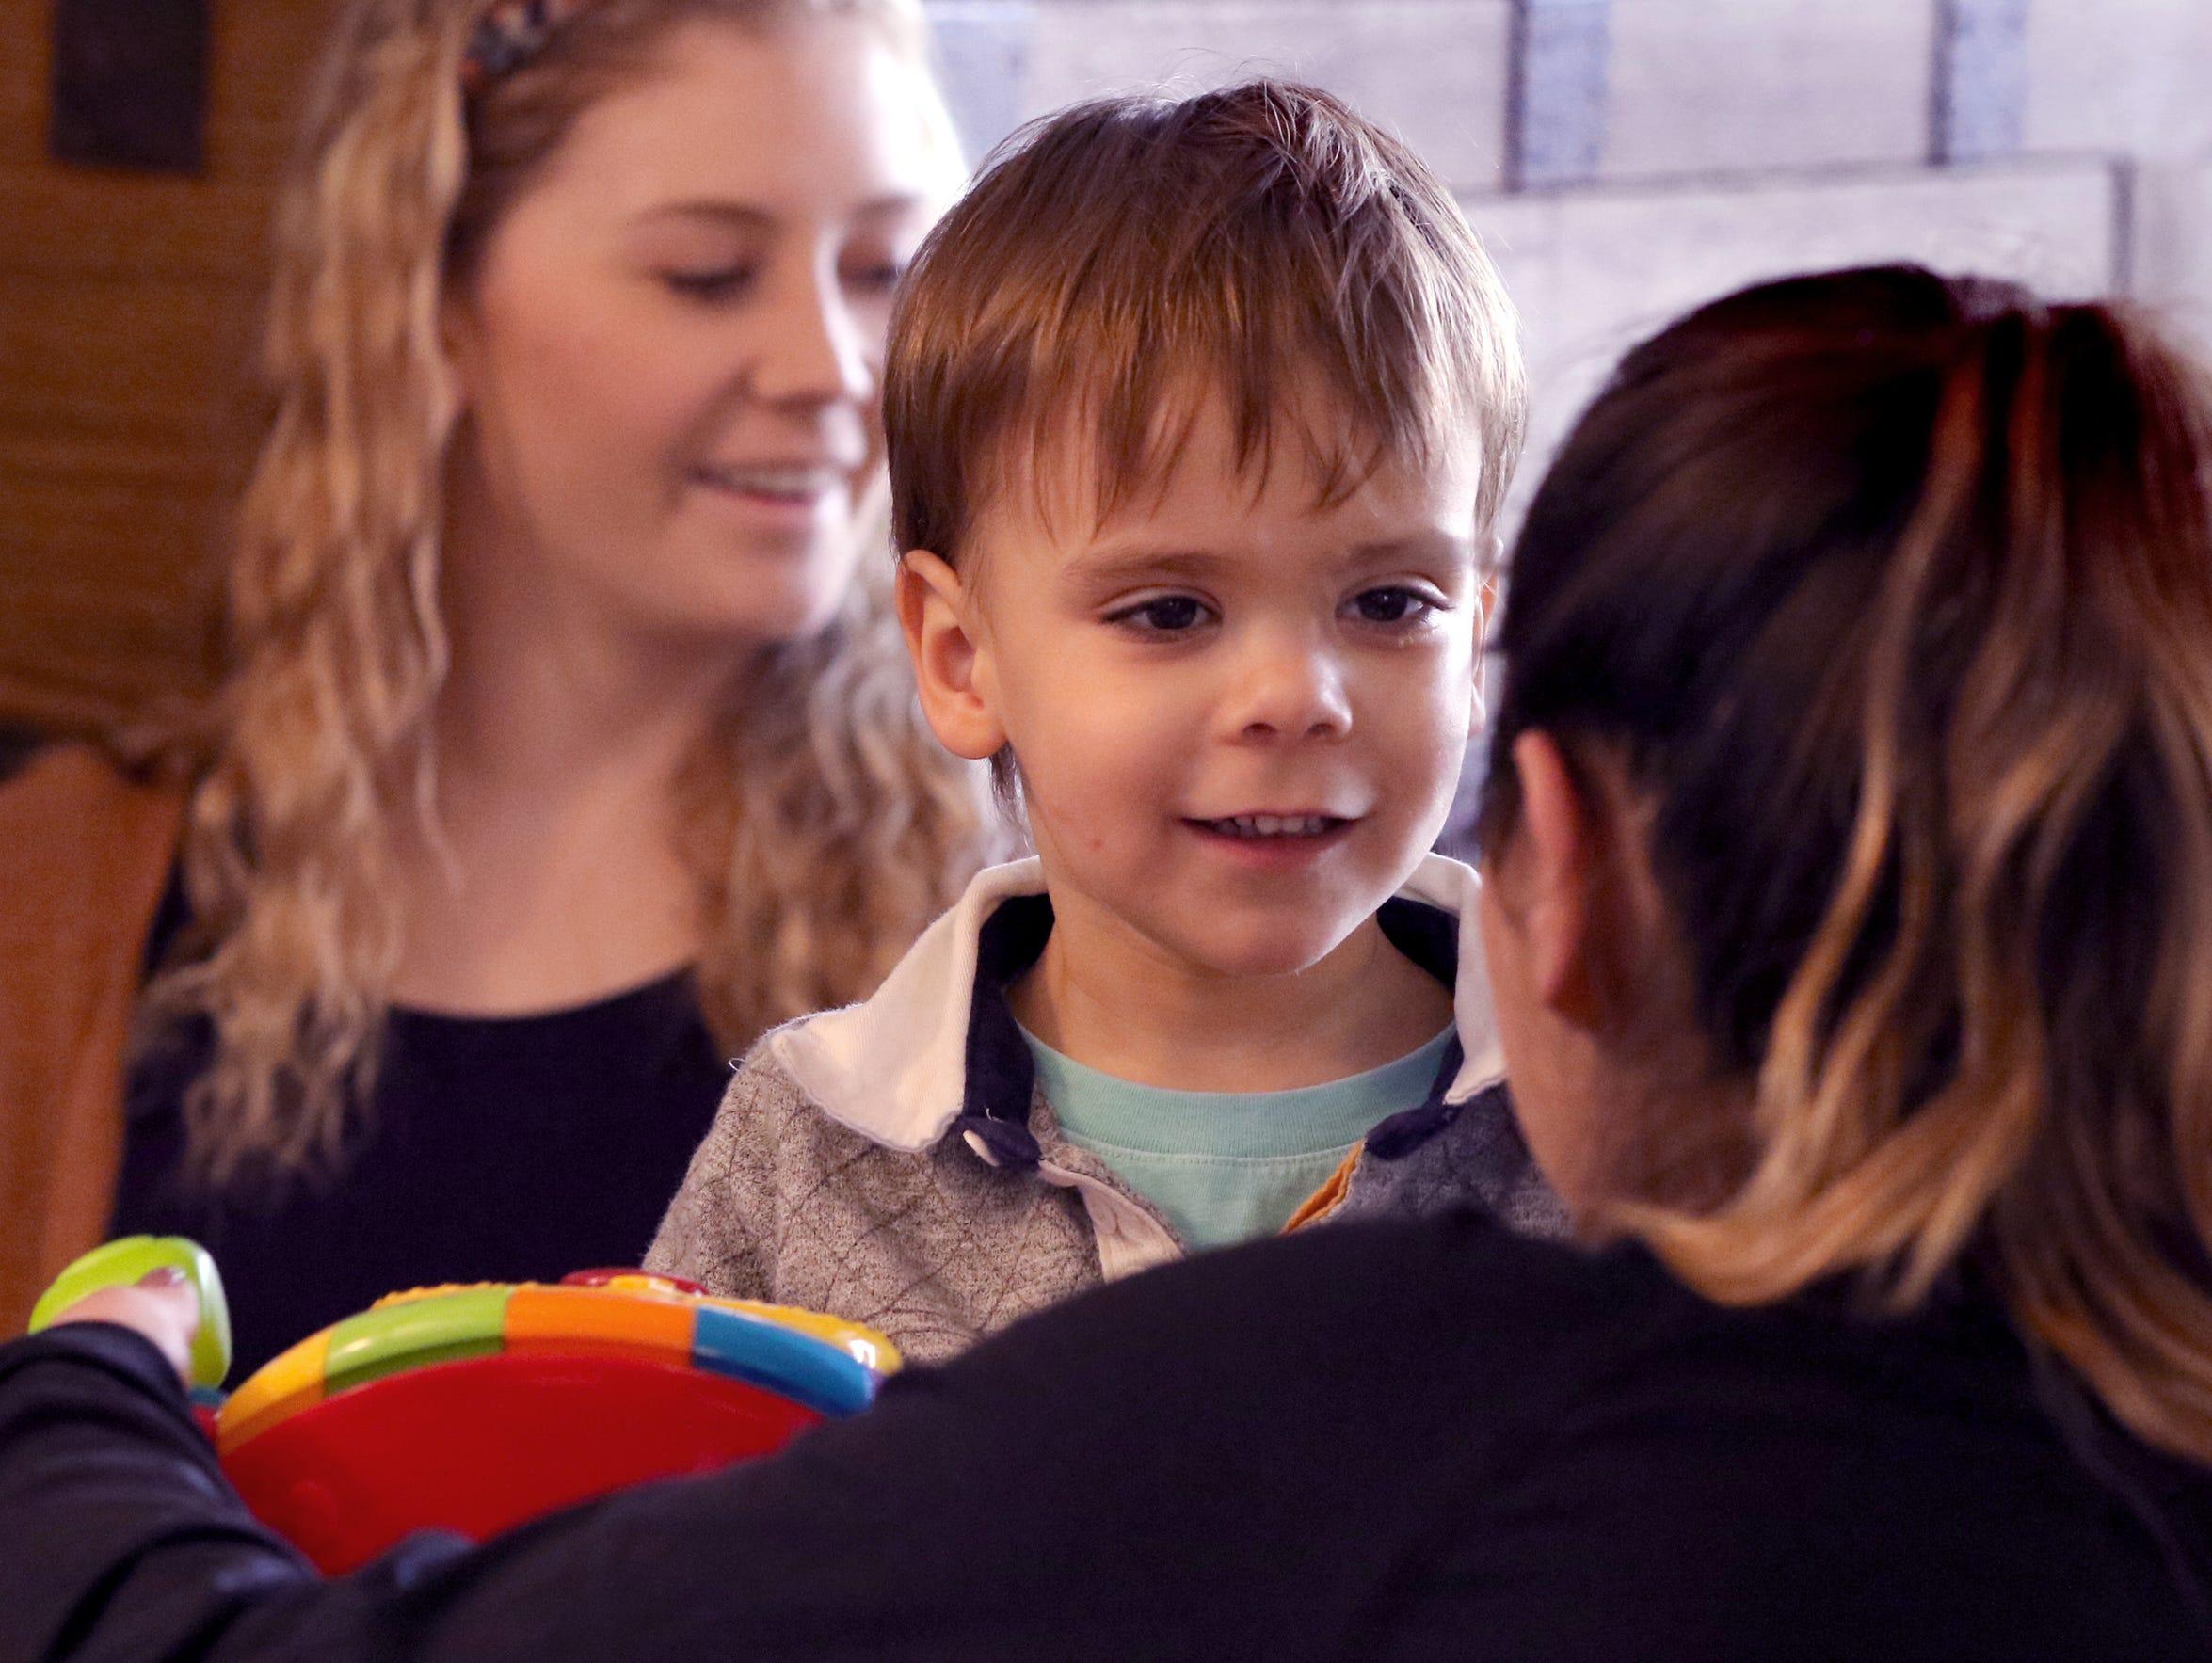 James Crimmins, 3, works with Kristin Gendreau, a UW-Milwaukee